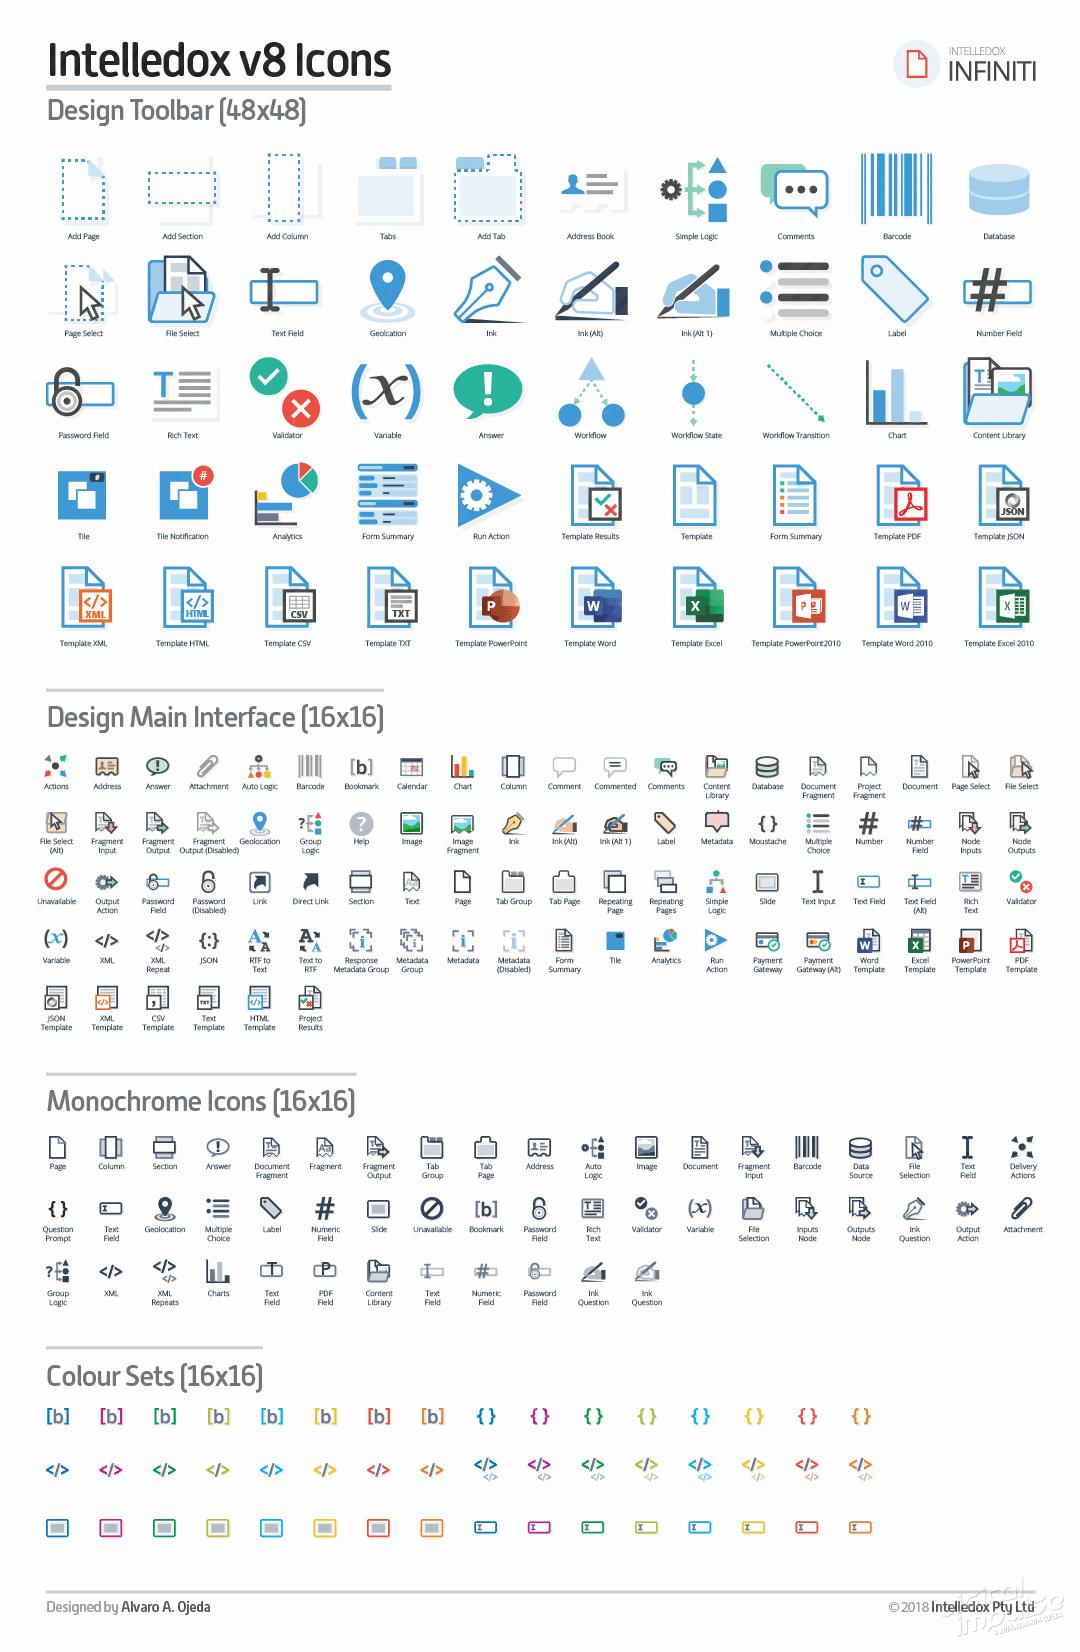 All Intelledox V8 Icons image